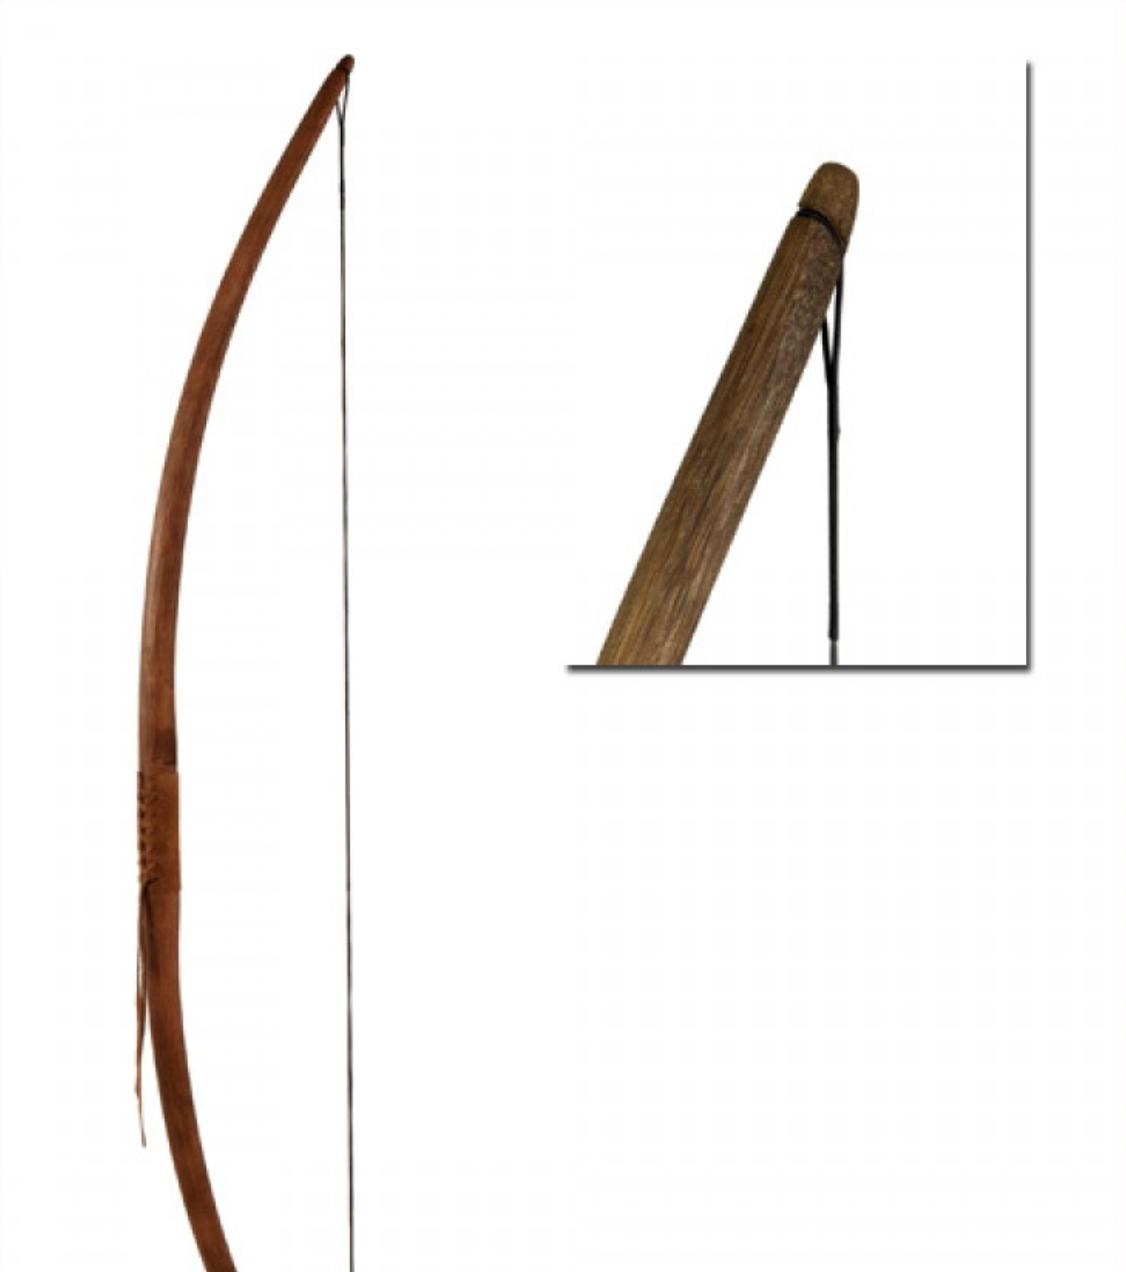 Pitkäjousi Agincourt 58 RH, dark brown, string included